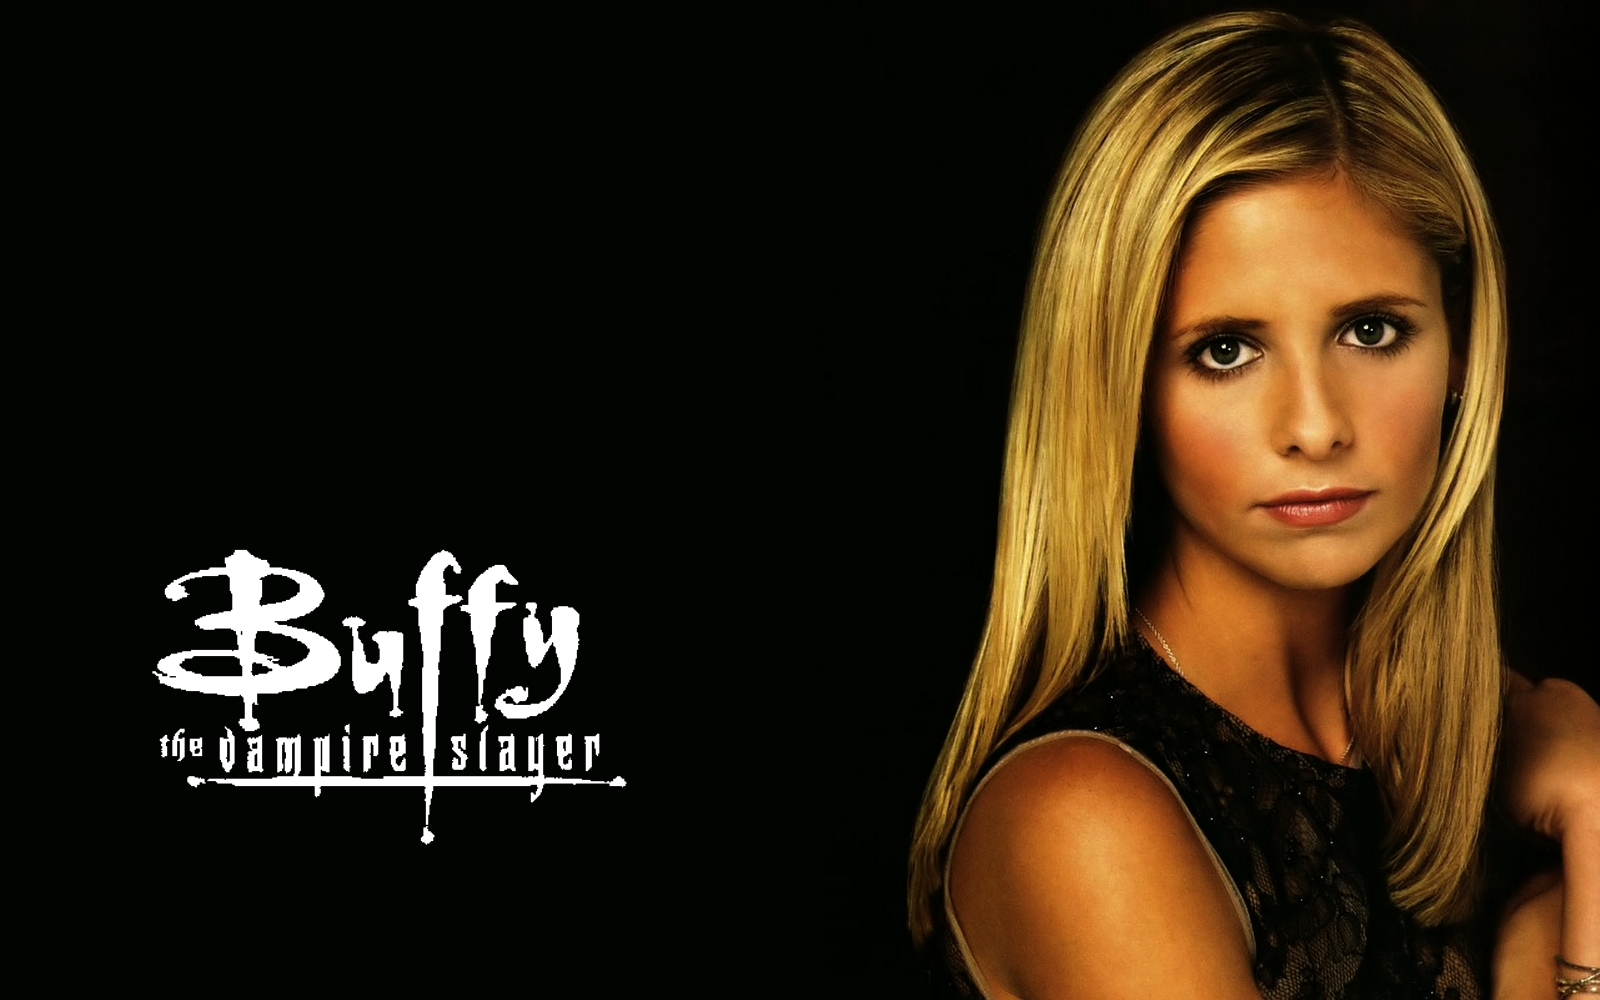 Wallpaperboard 10 Buffy The Vampire Slayer Wallpaper